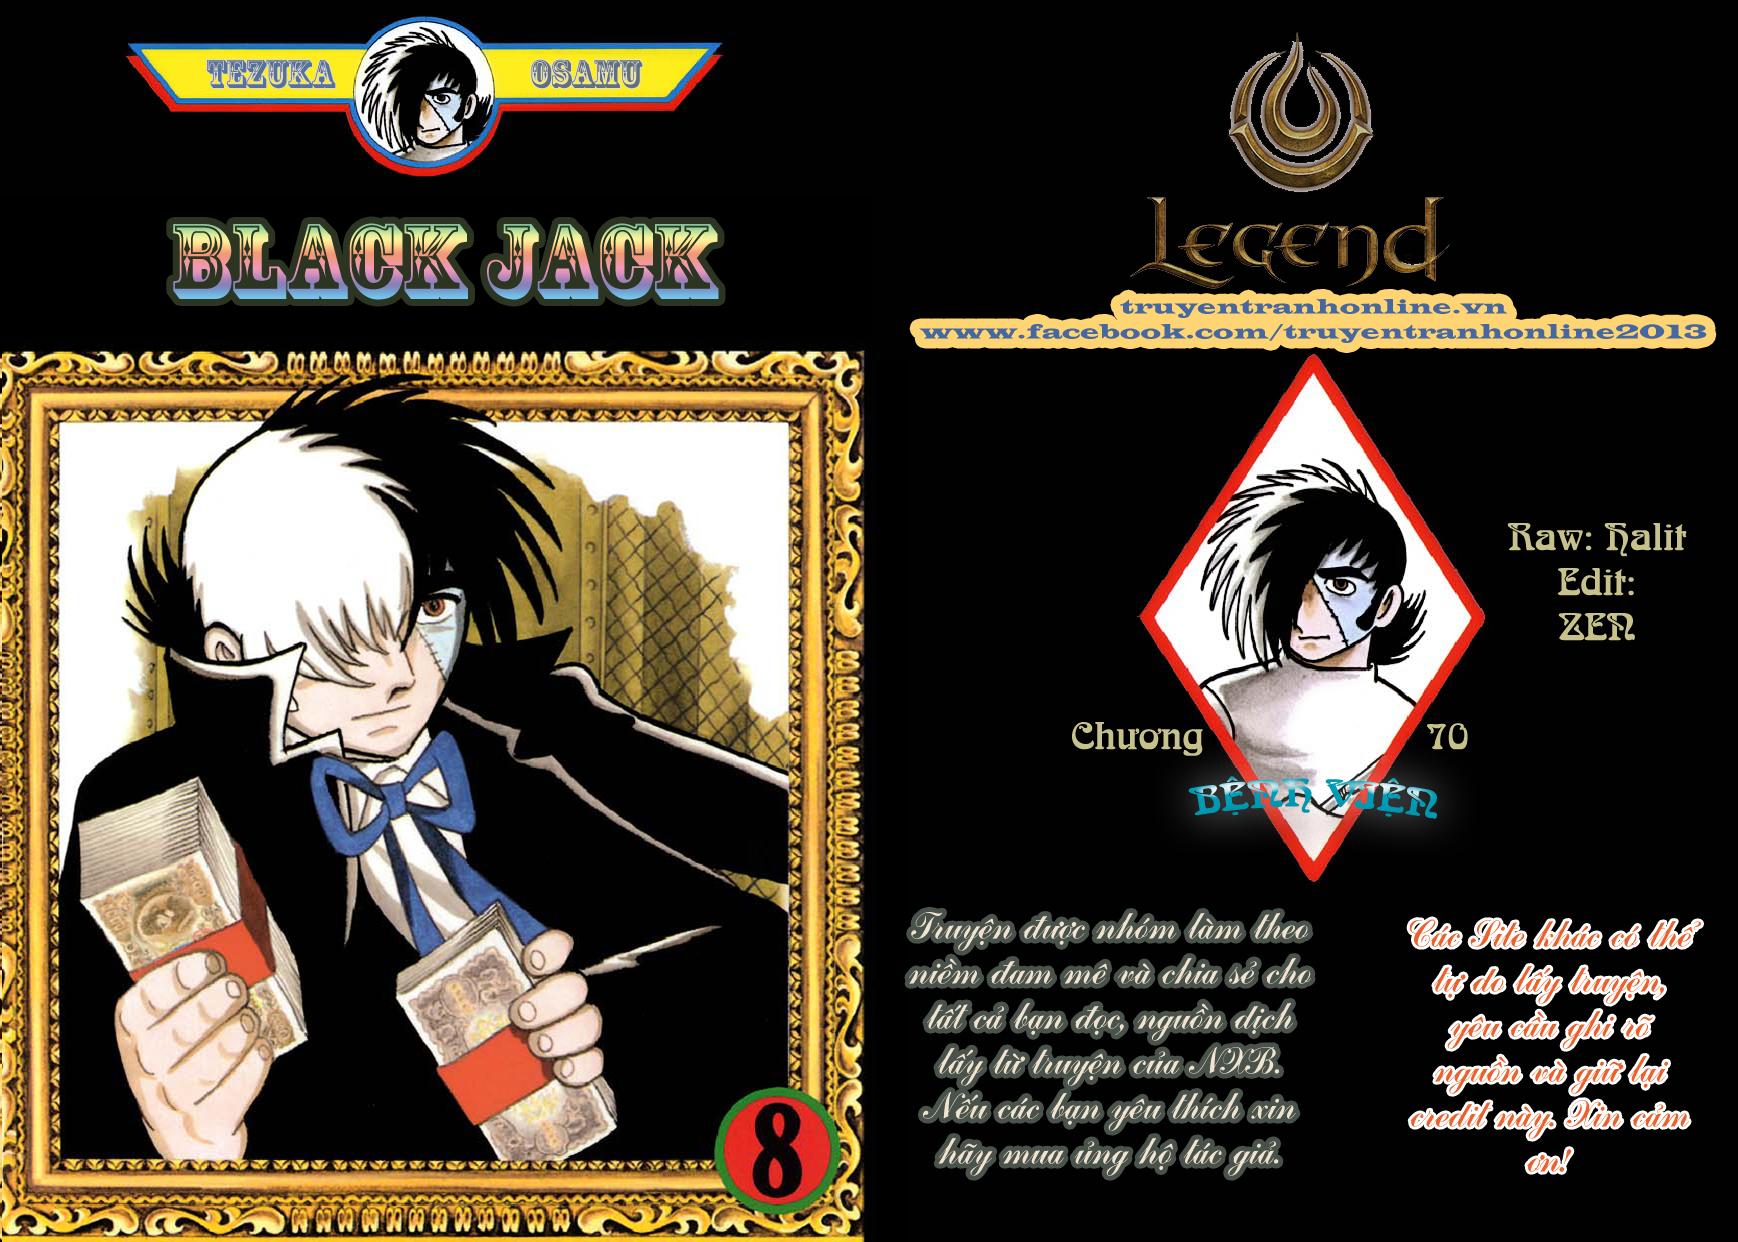 Blackjack xem online